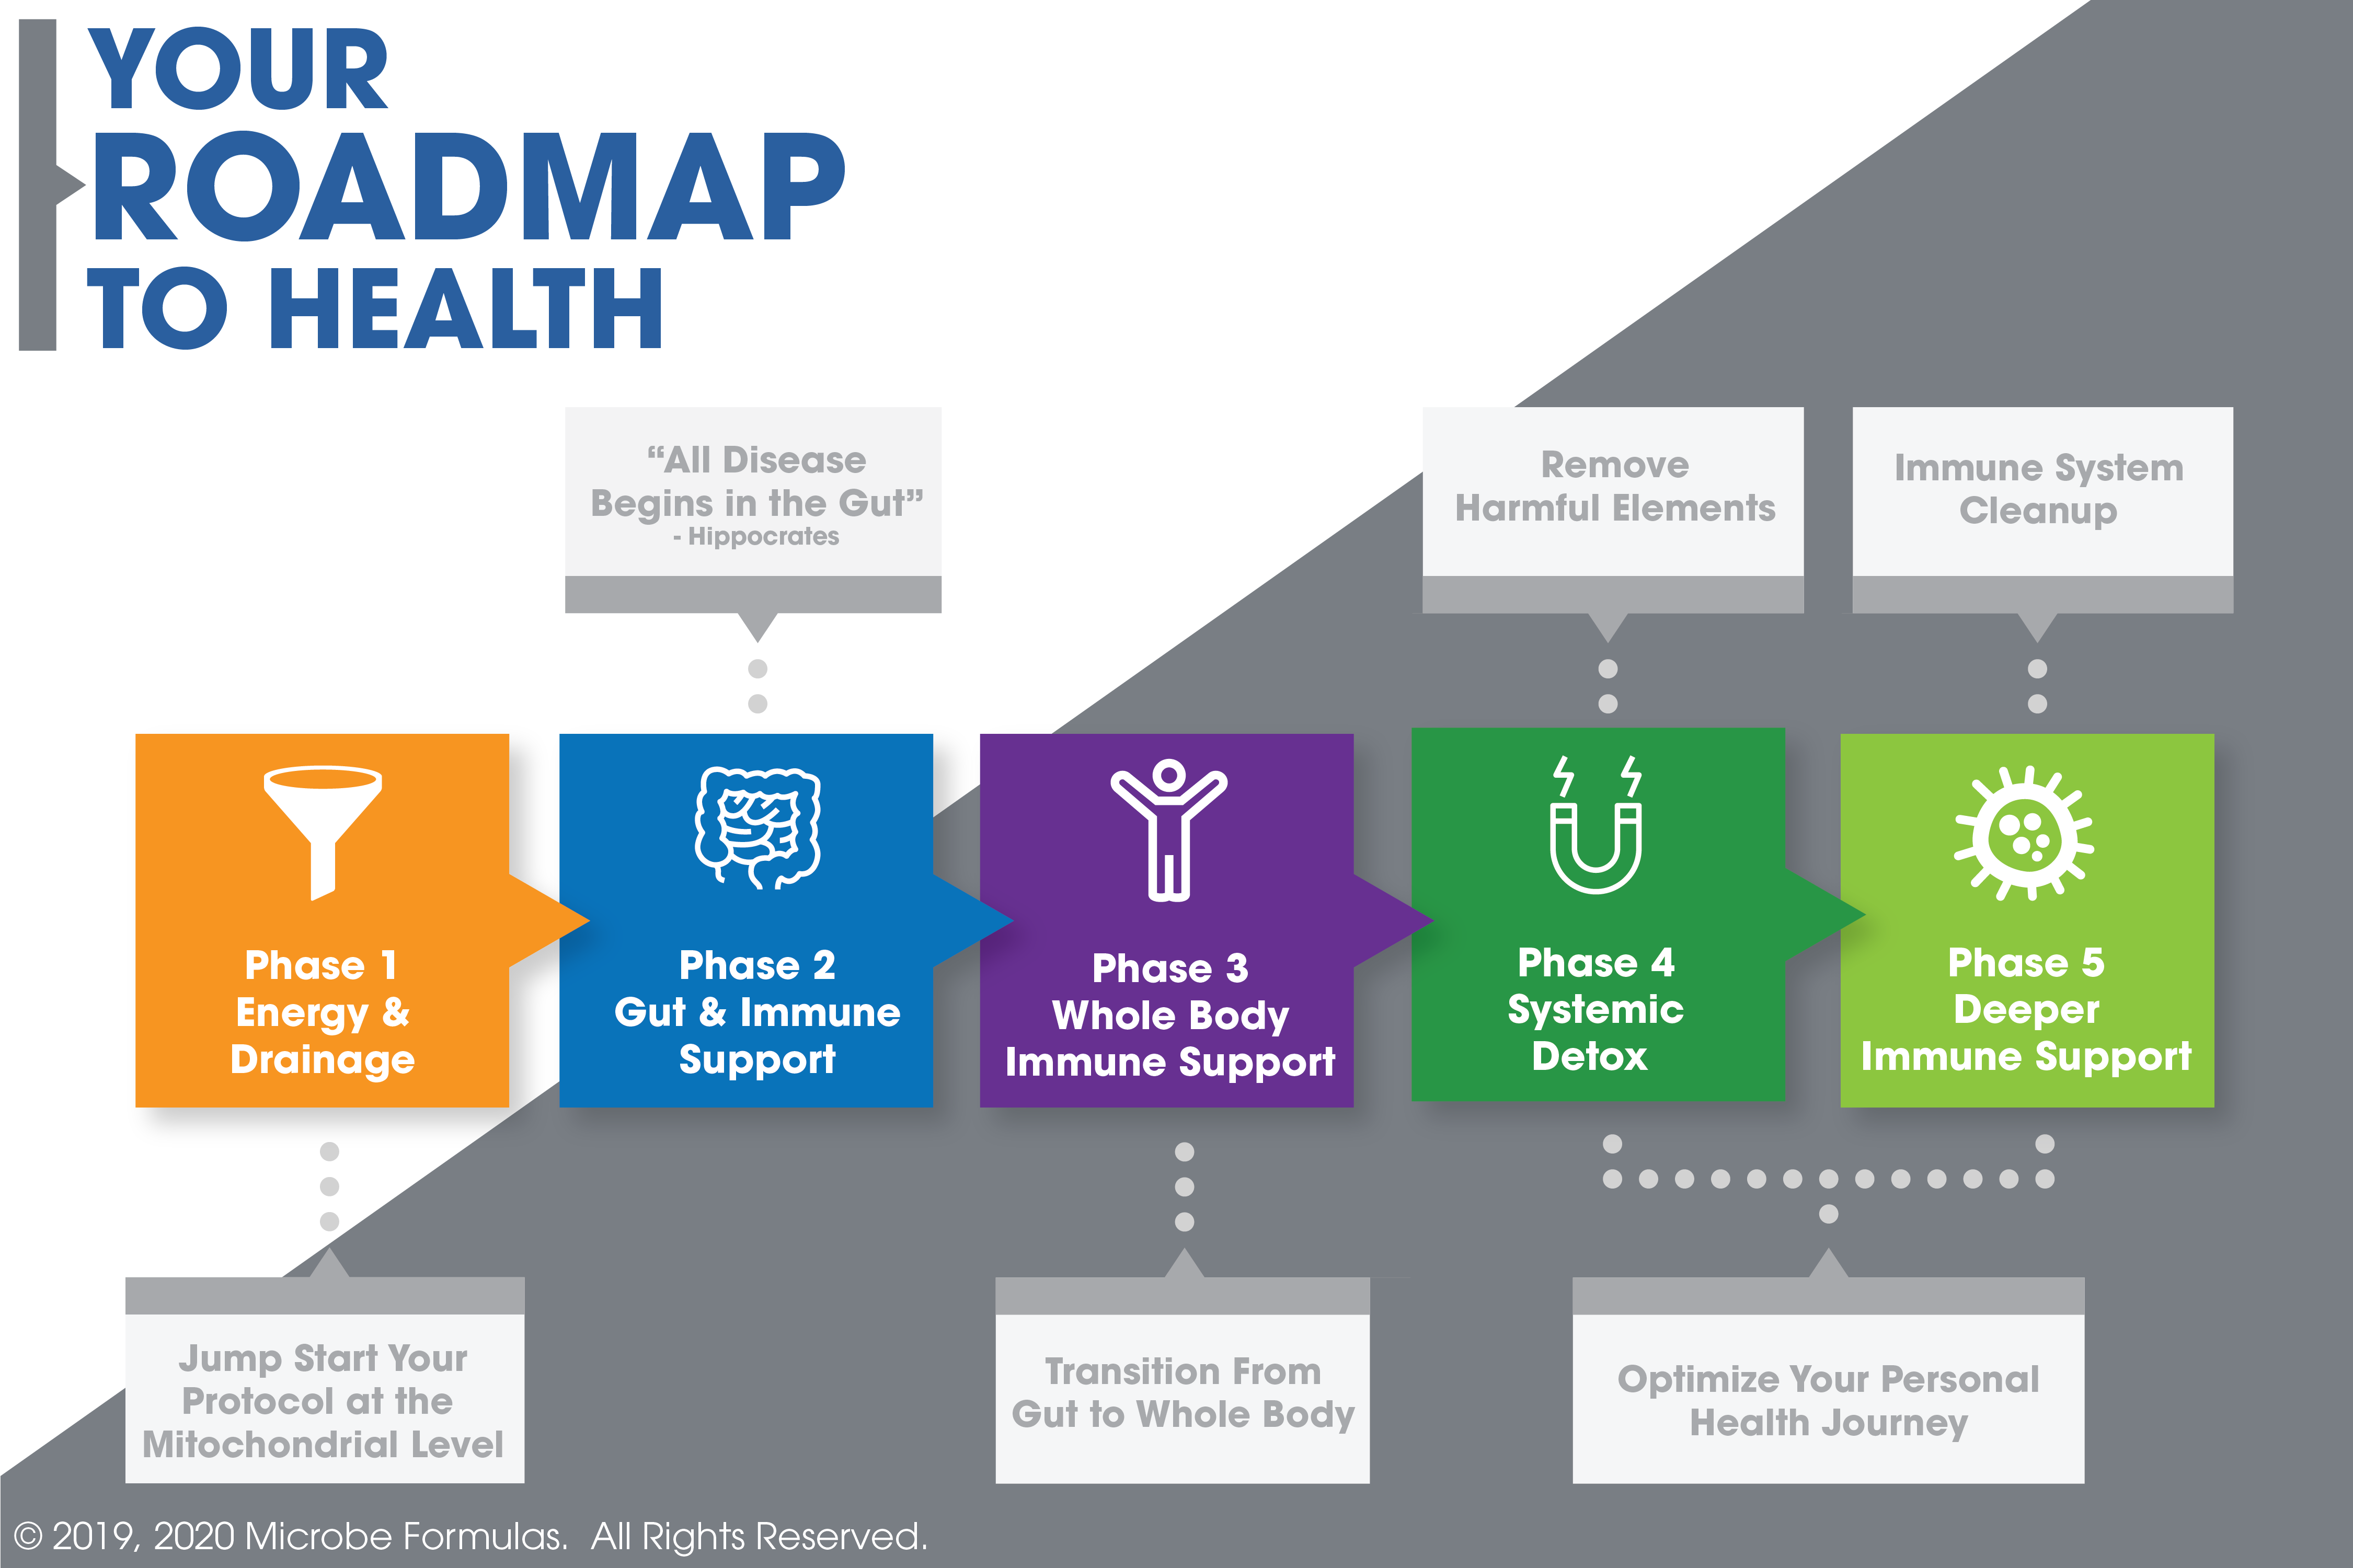 Readmap to Health